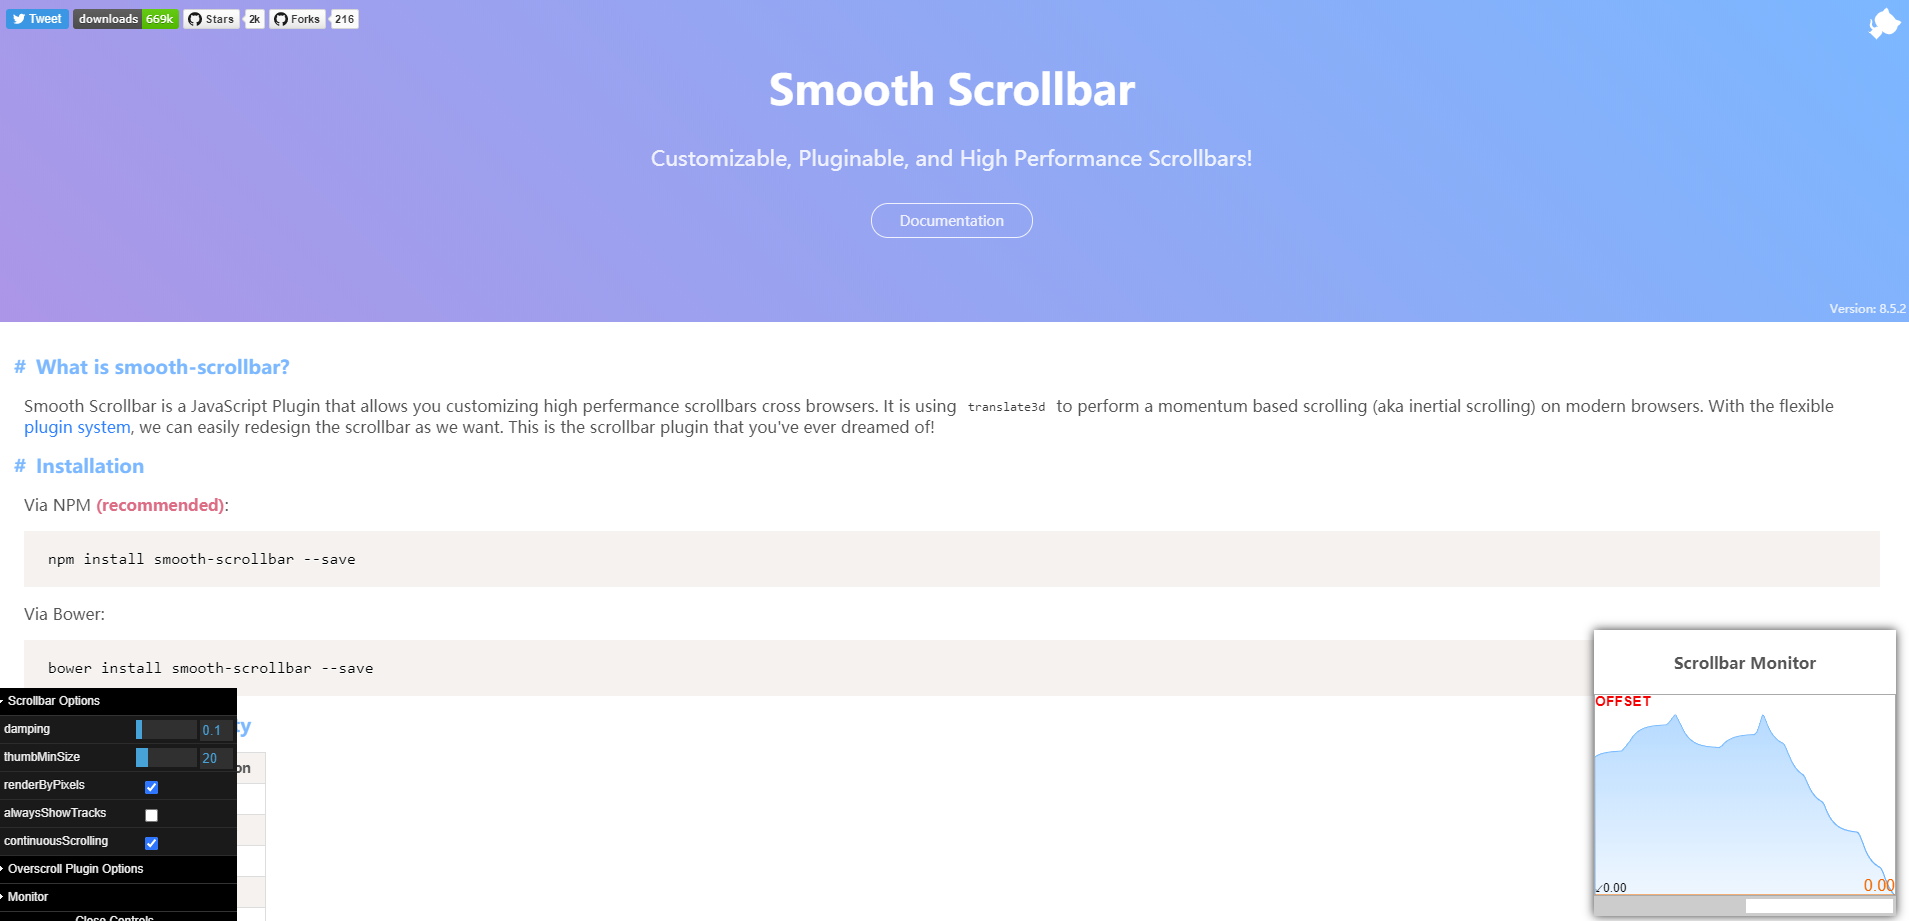 Smooth Scrollbar 平滑滾動條 JS 套件 可讓滾輪更自然